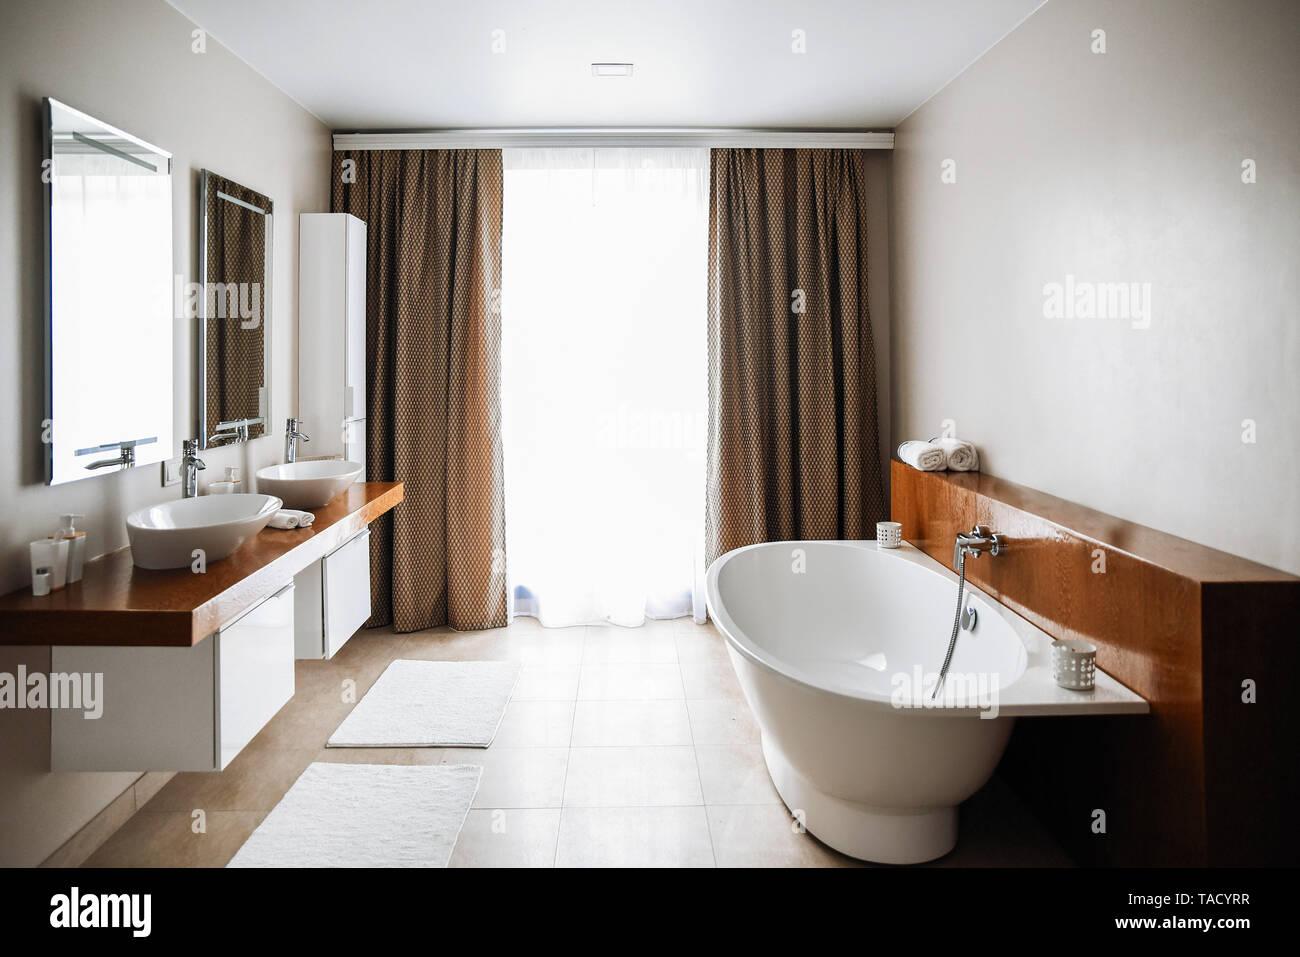 Cuarto de baño contemporáneo, gran diseño interior. Baño moderno ...